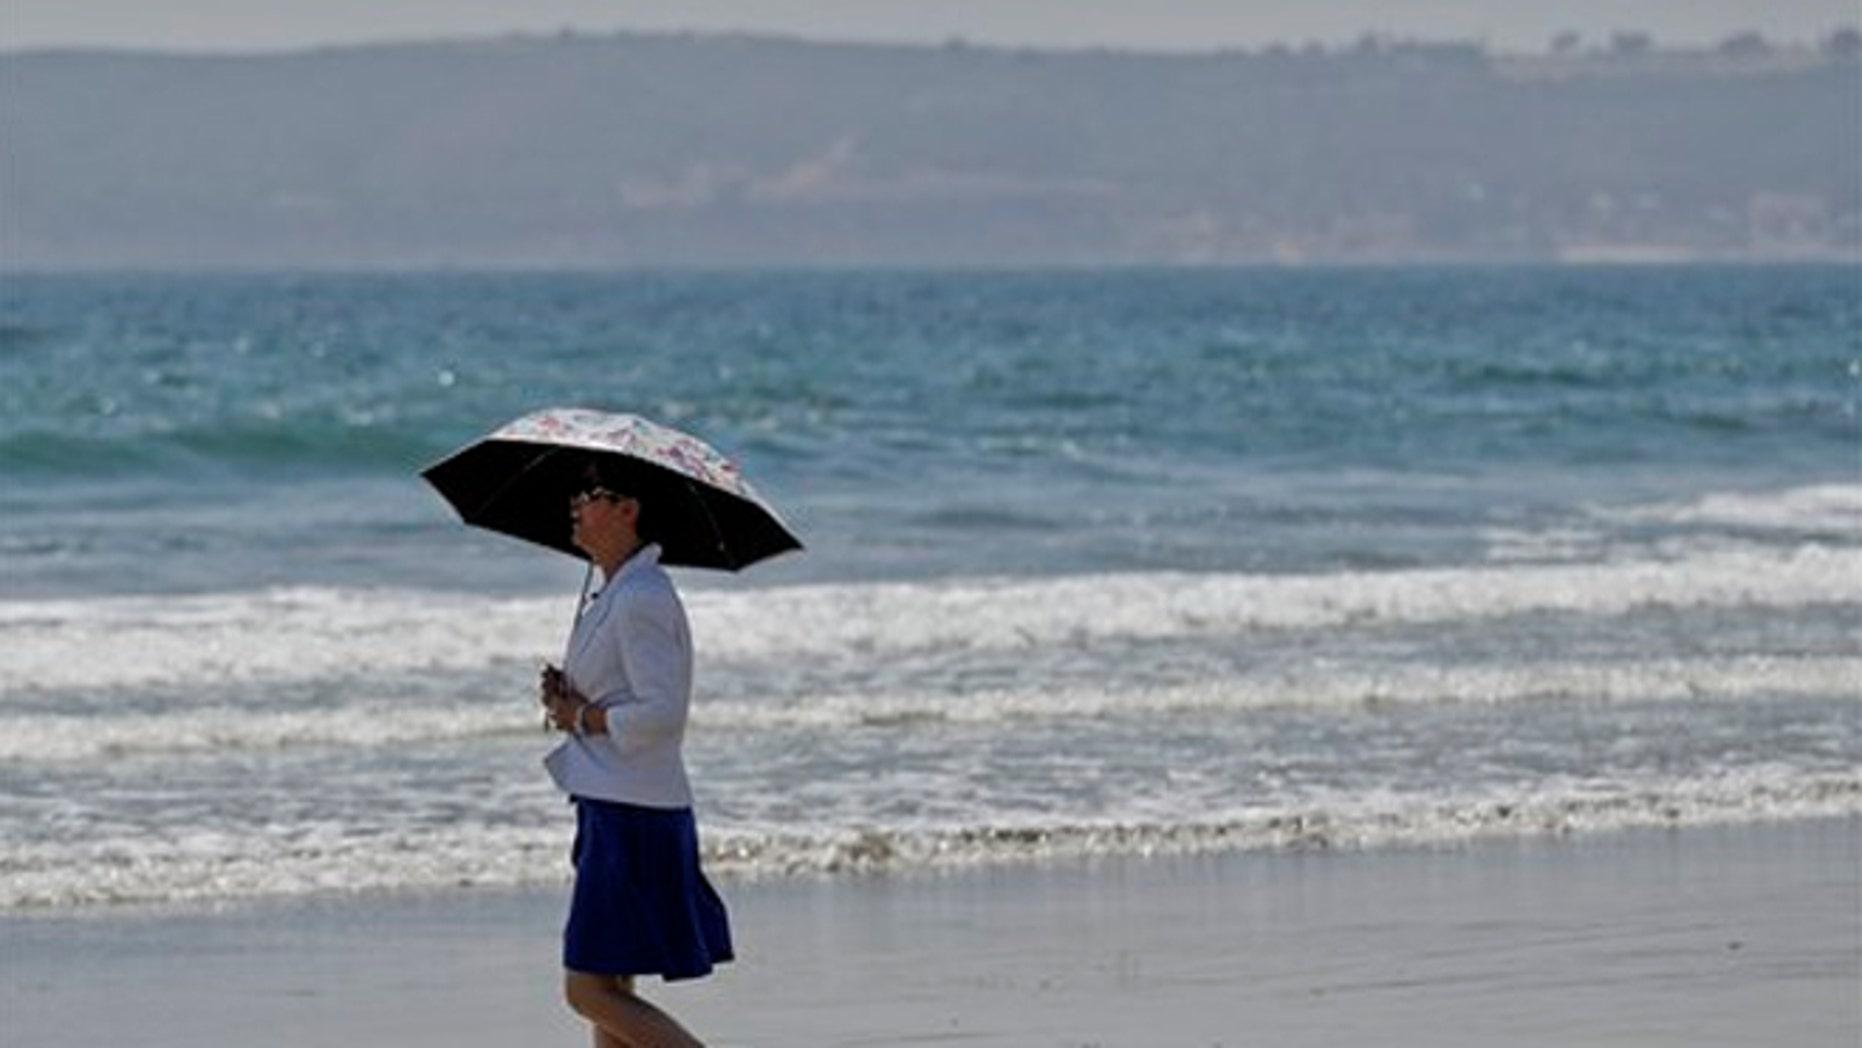 May 22, 2012: The Coronado Beach has been named America's best beach.